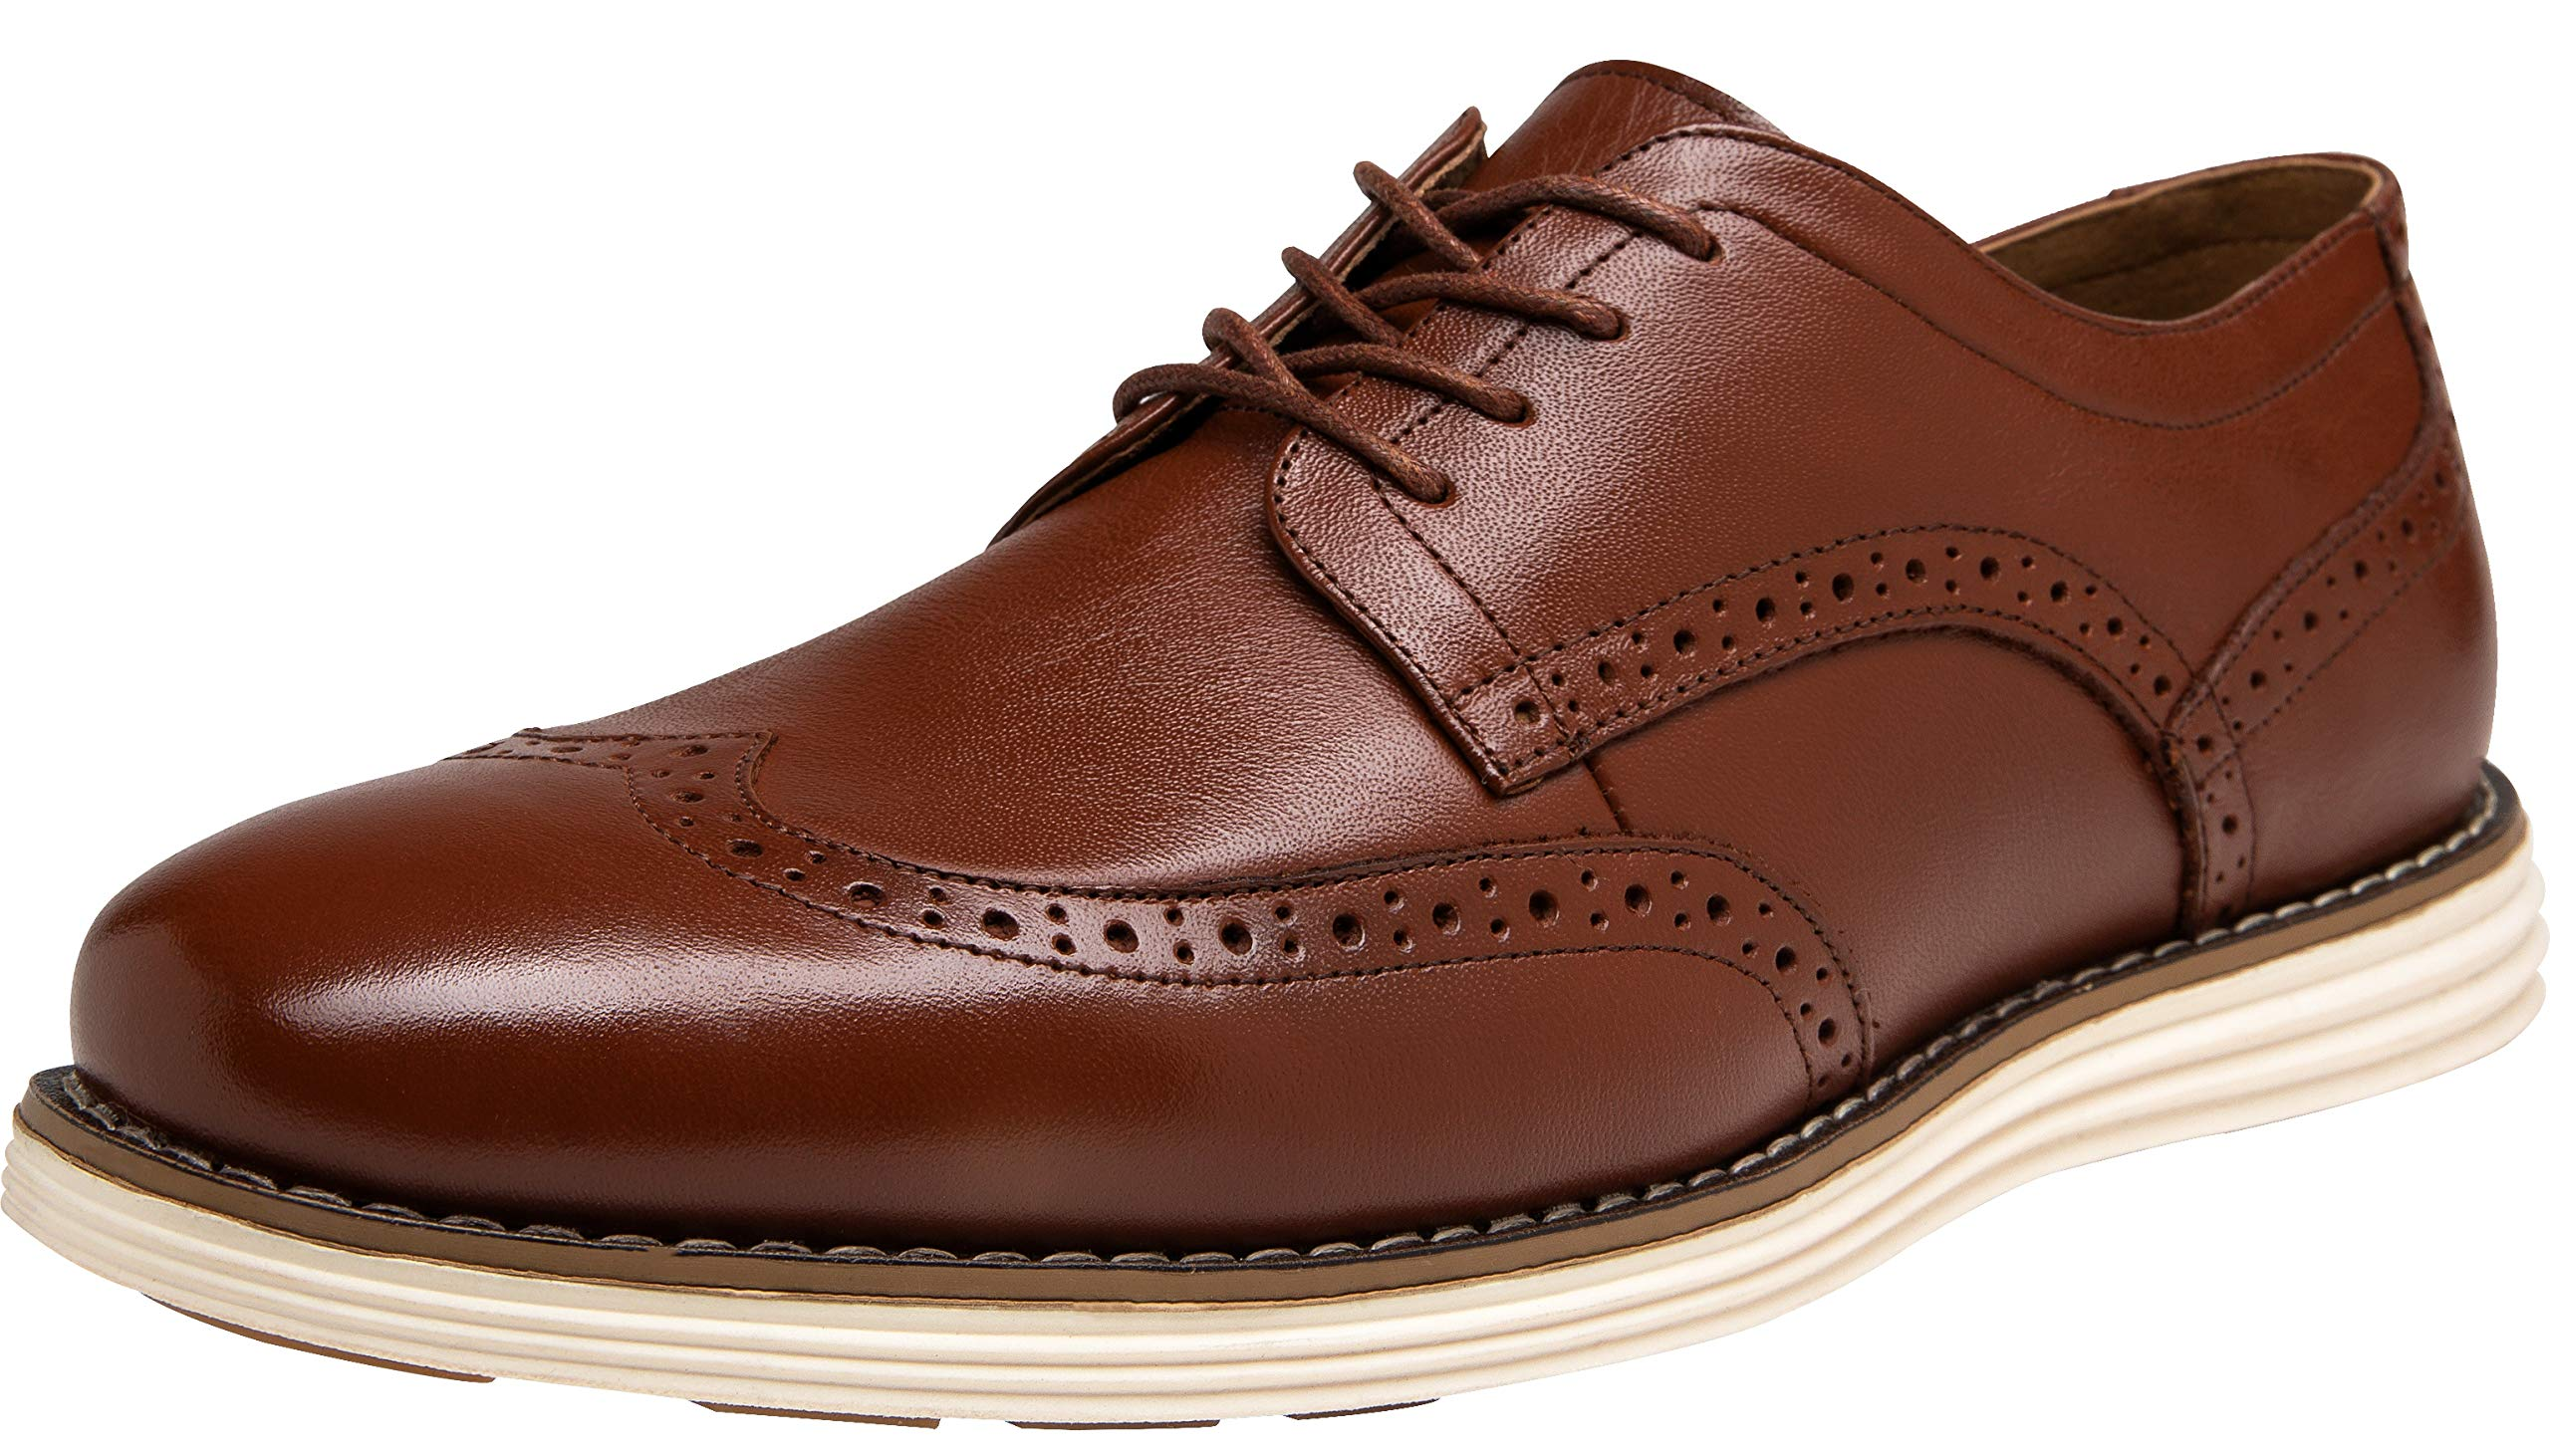 JOUSEN Men's Oxford Leather Dress Shoes Brogue Wingtip Casual Shoes (10,Wingtip-Oxblood)